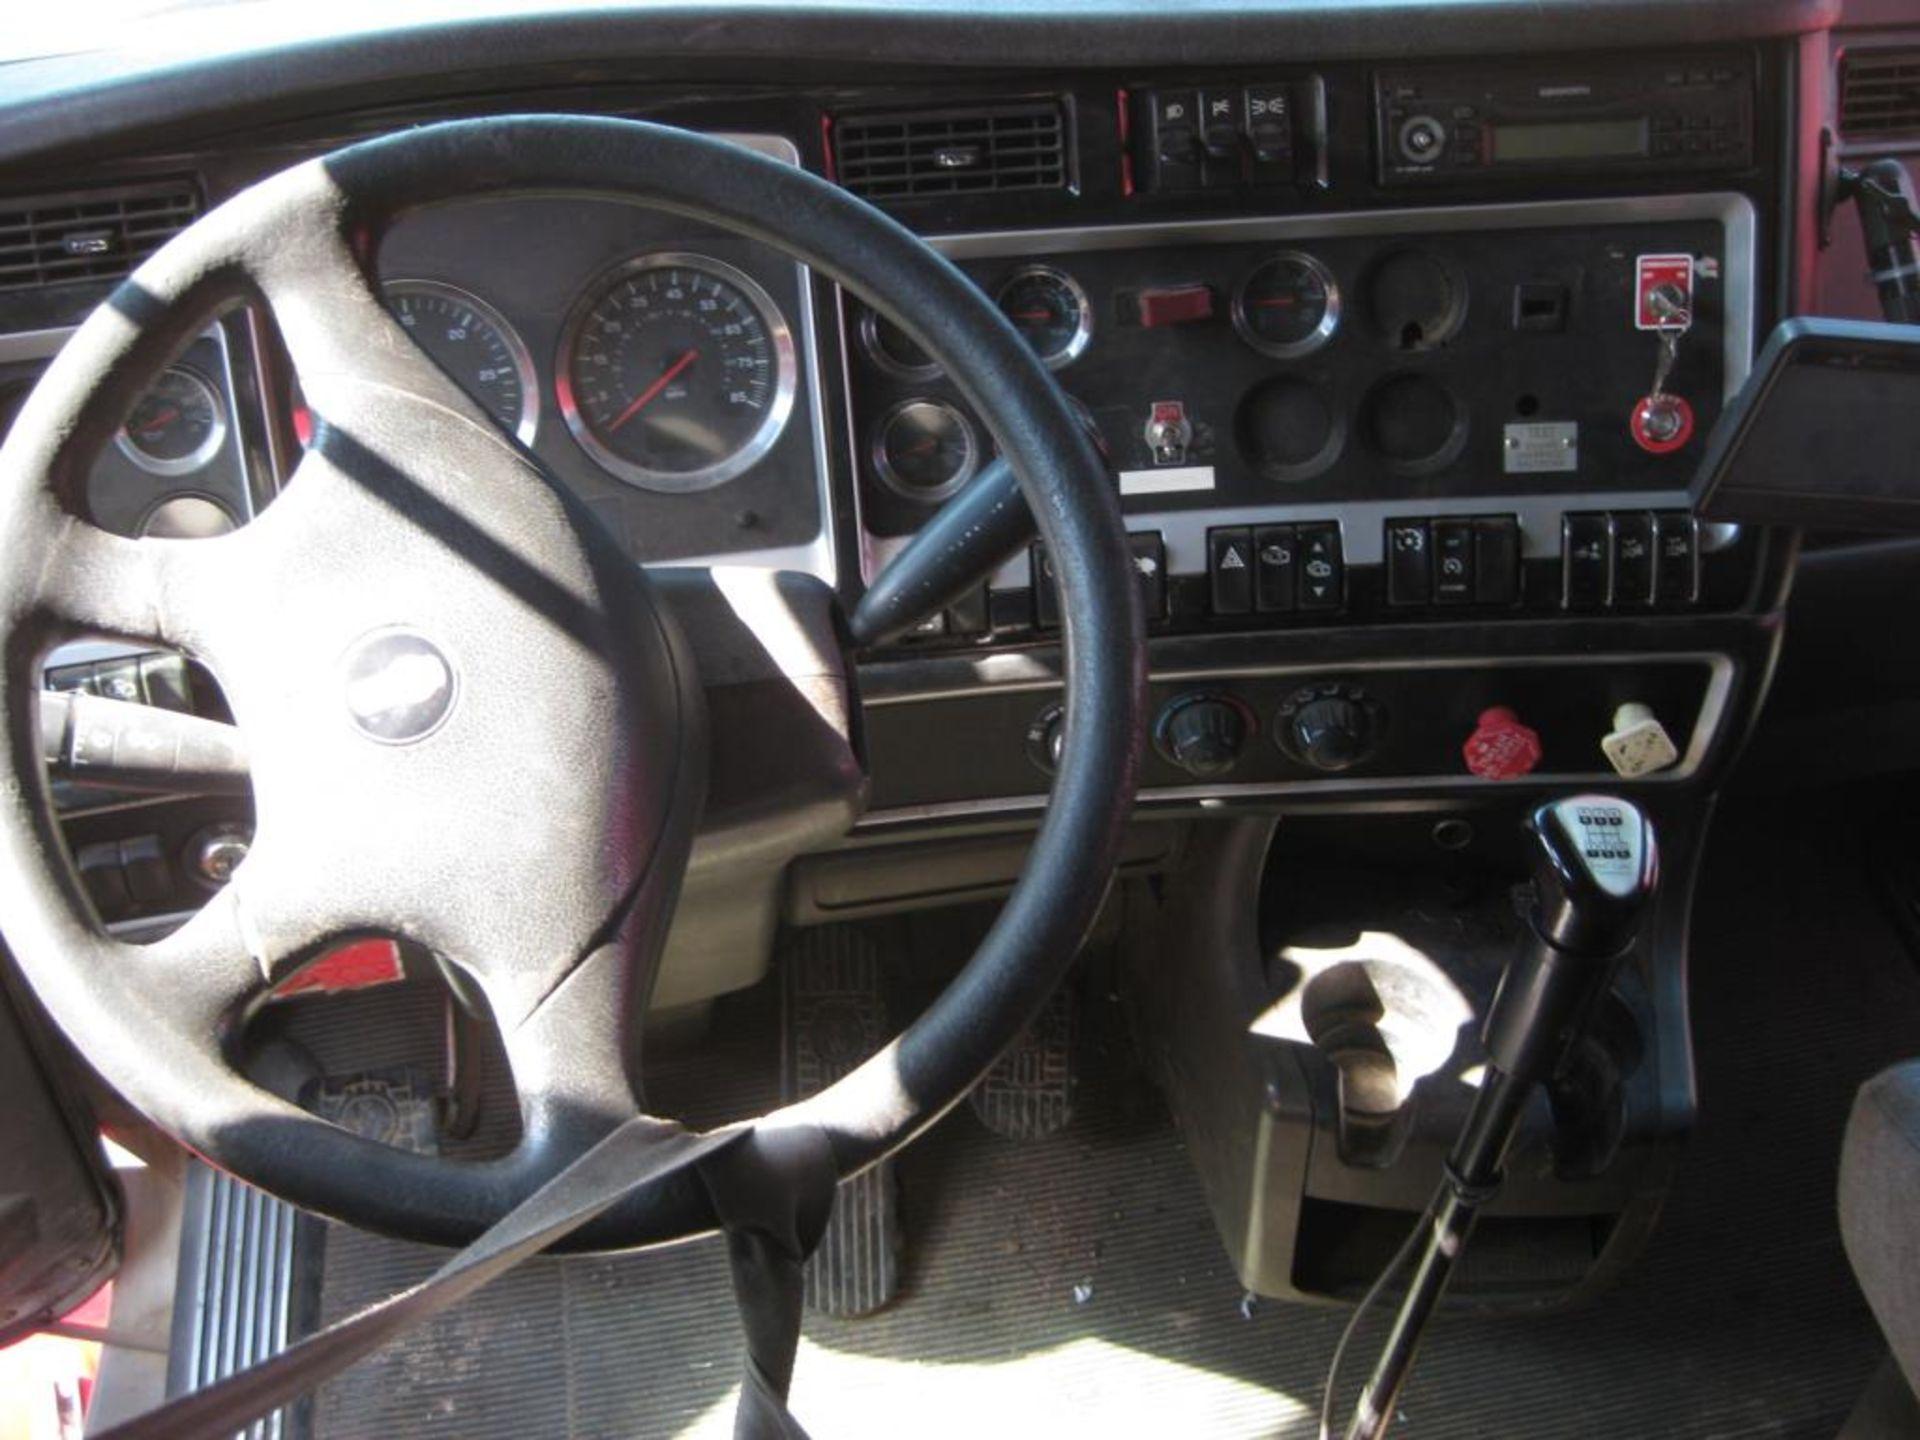 Kenworth Truck - Image 16 of 21